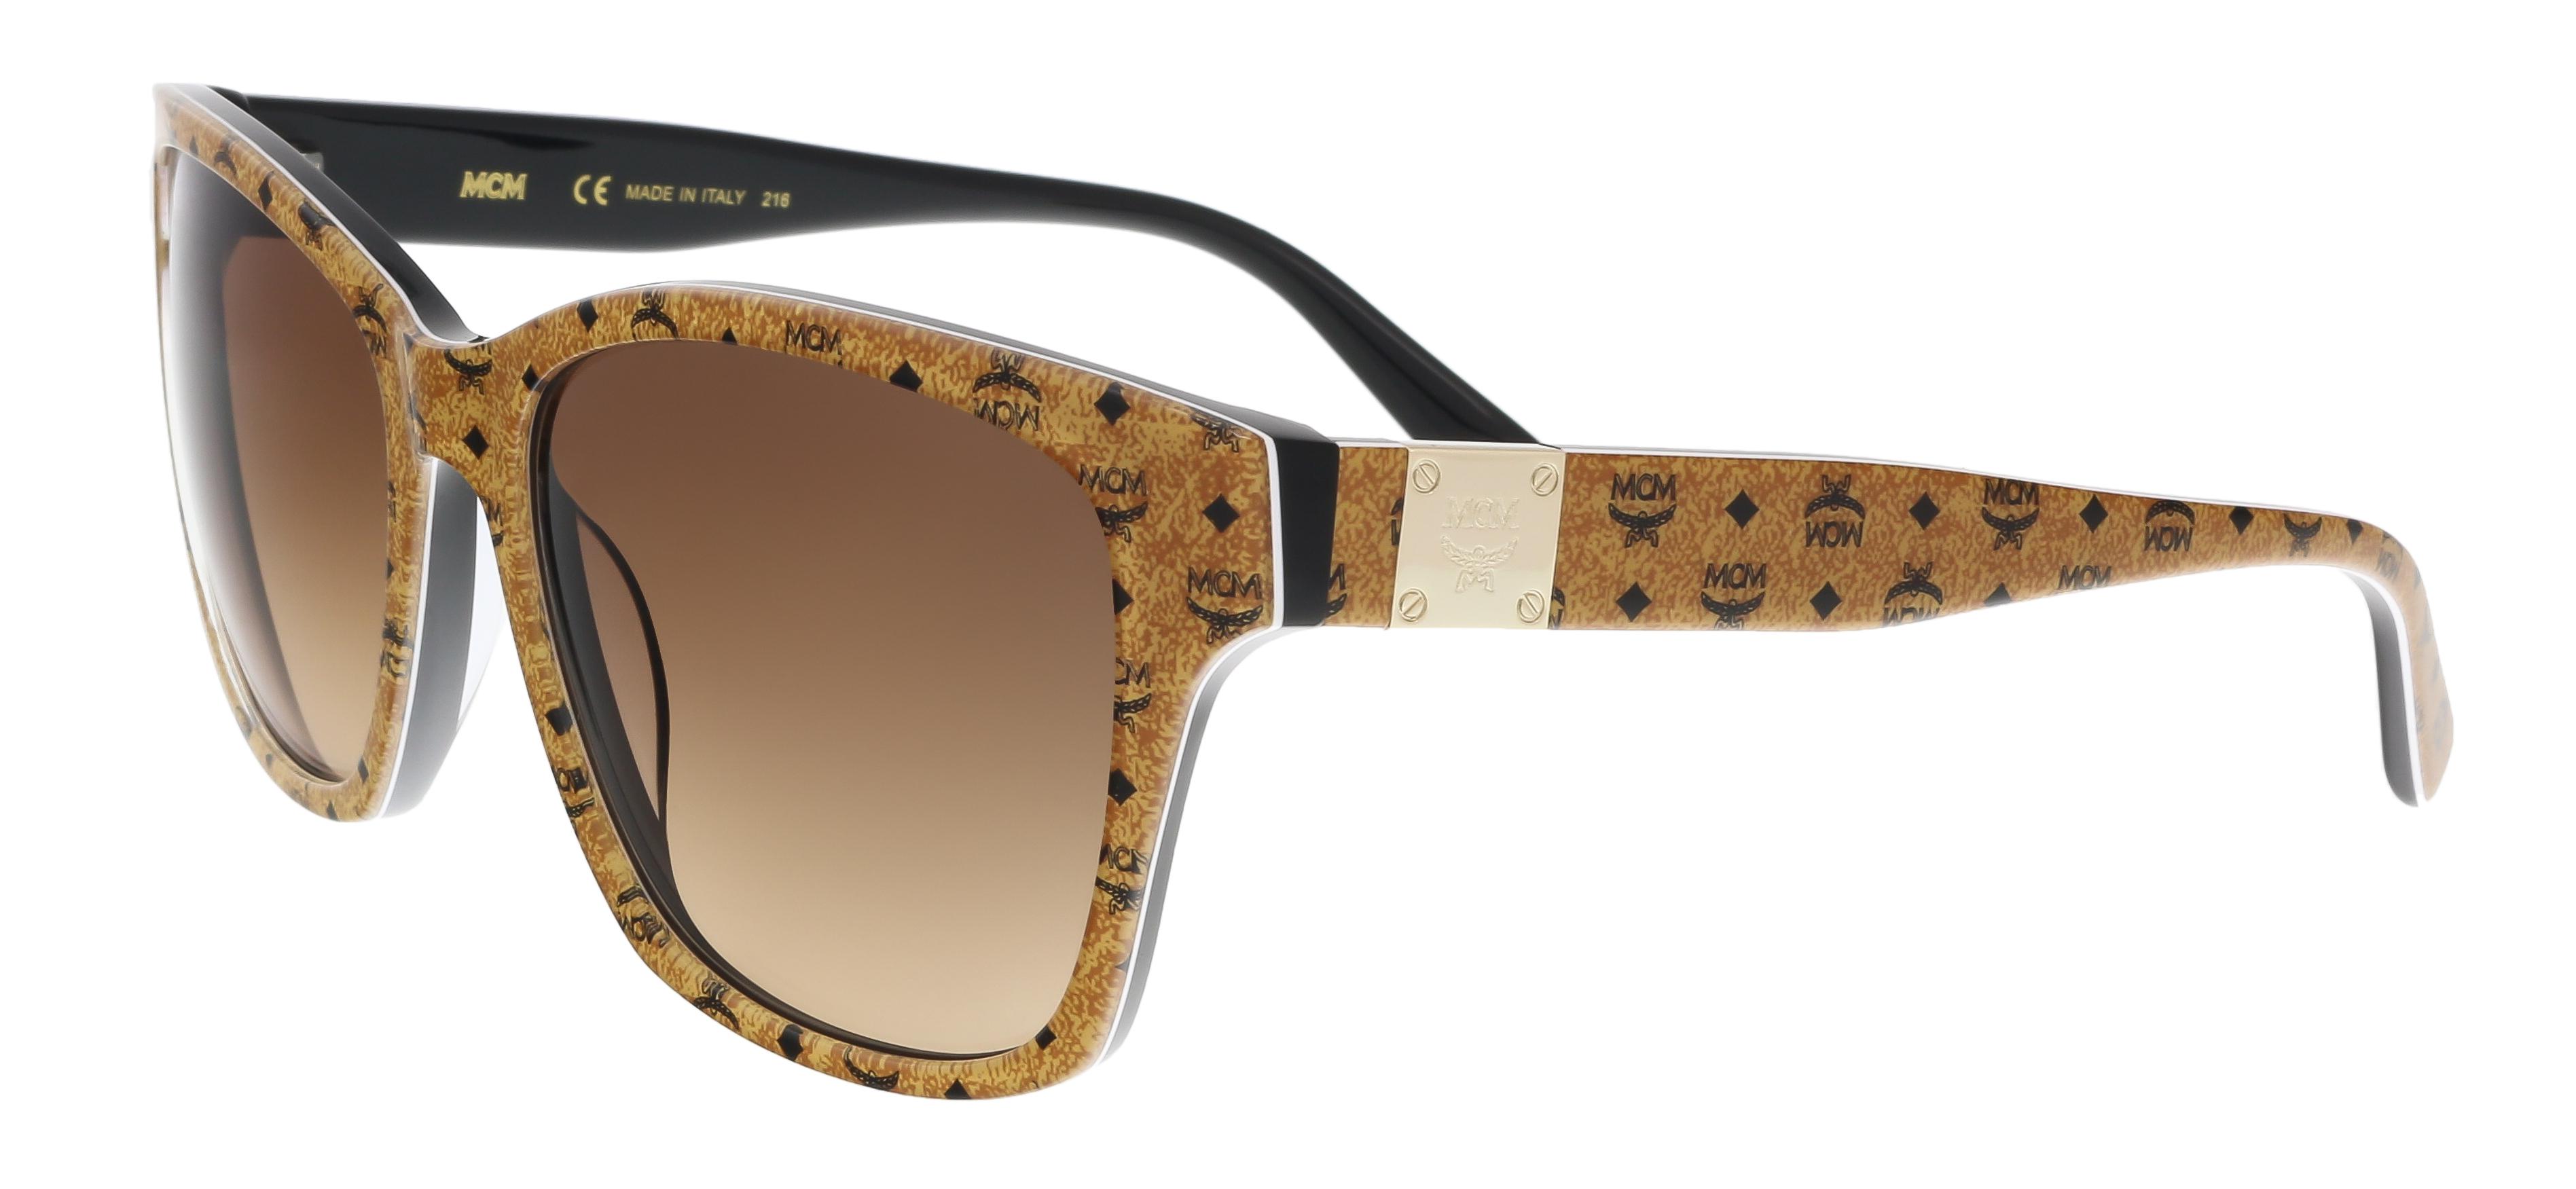 MCM600S 208 Brown Visettos Wayfarer Feline Sunglasses